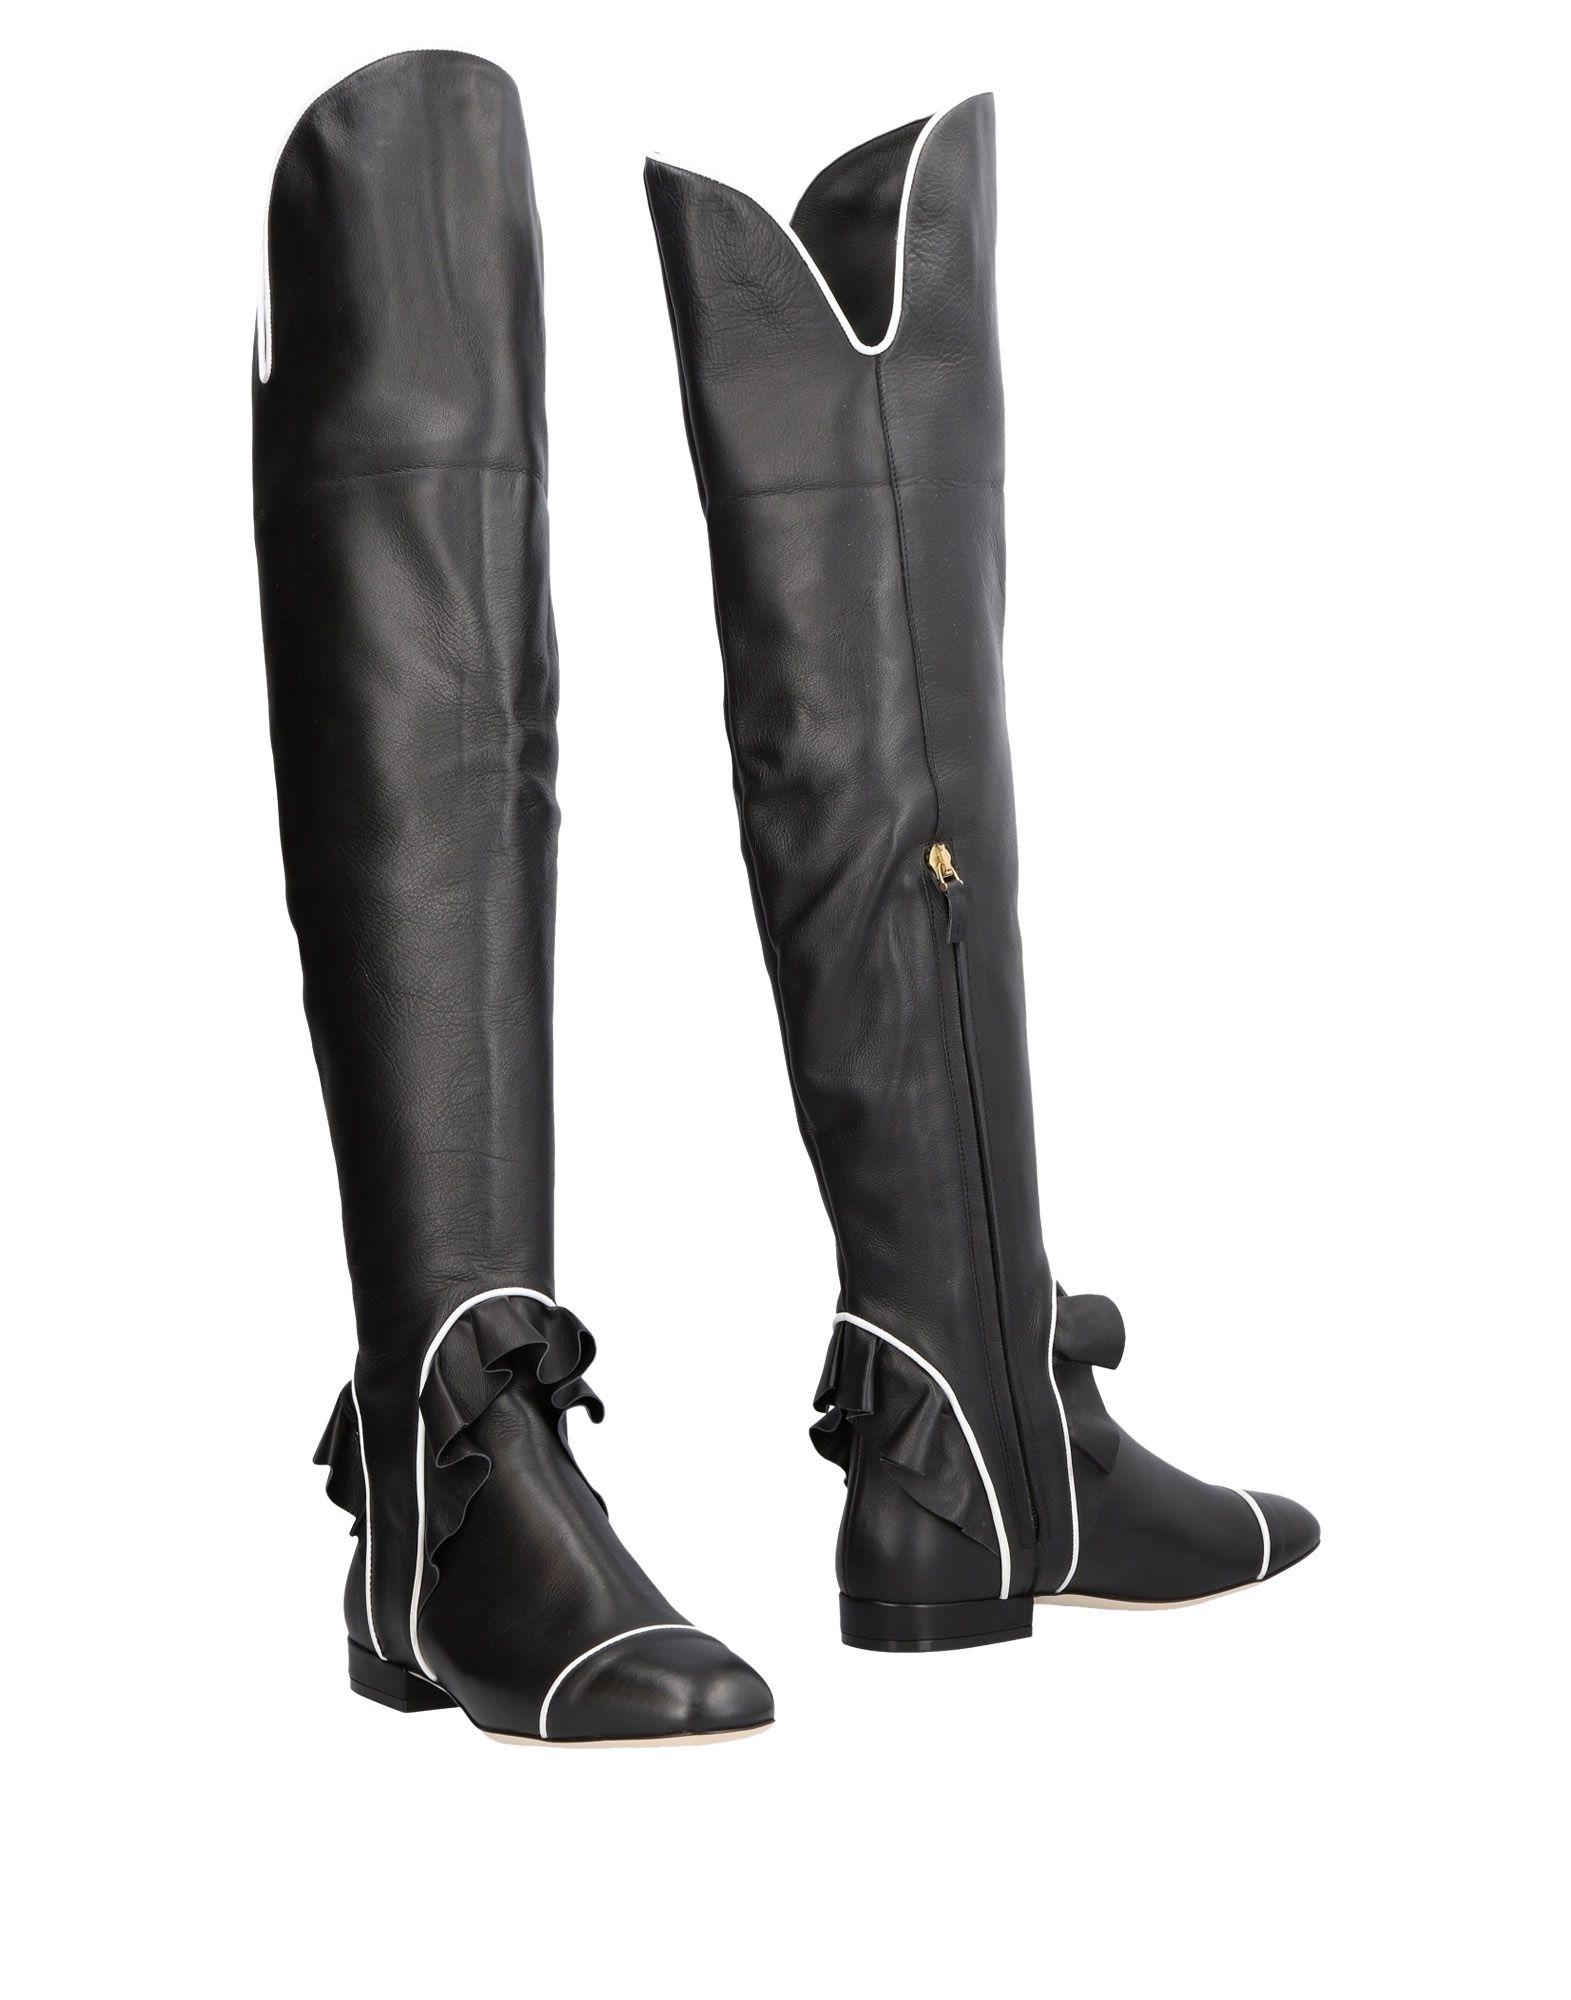 Racine Carrée Boots - Women on Racine Carrée Boots online on Women  Canada - 11484674DR 6e3588